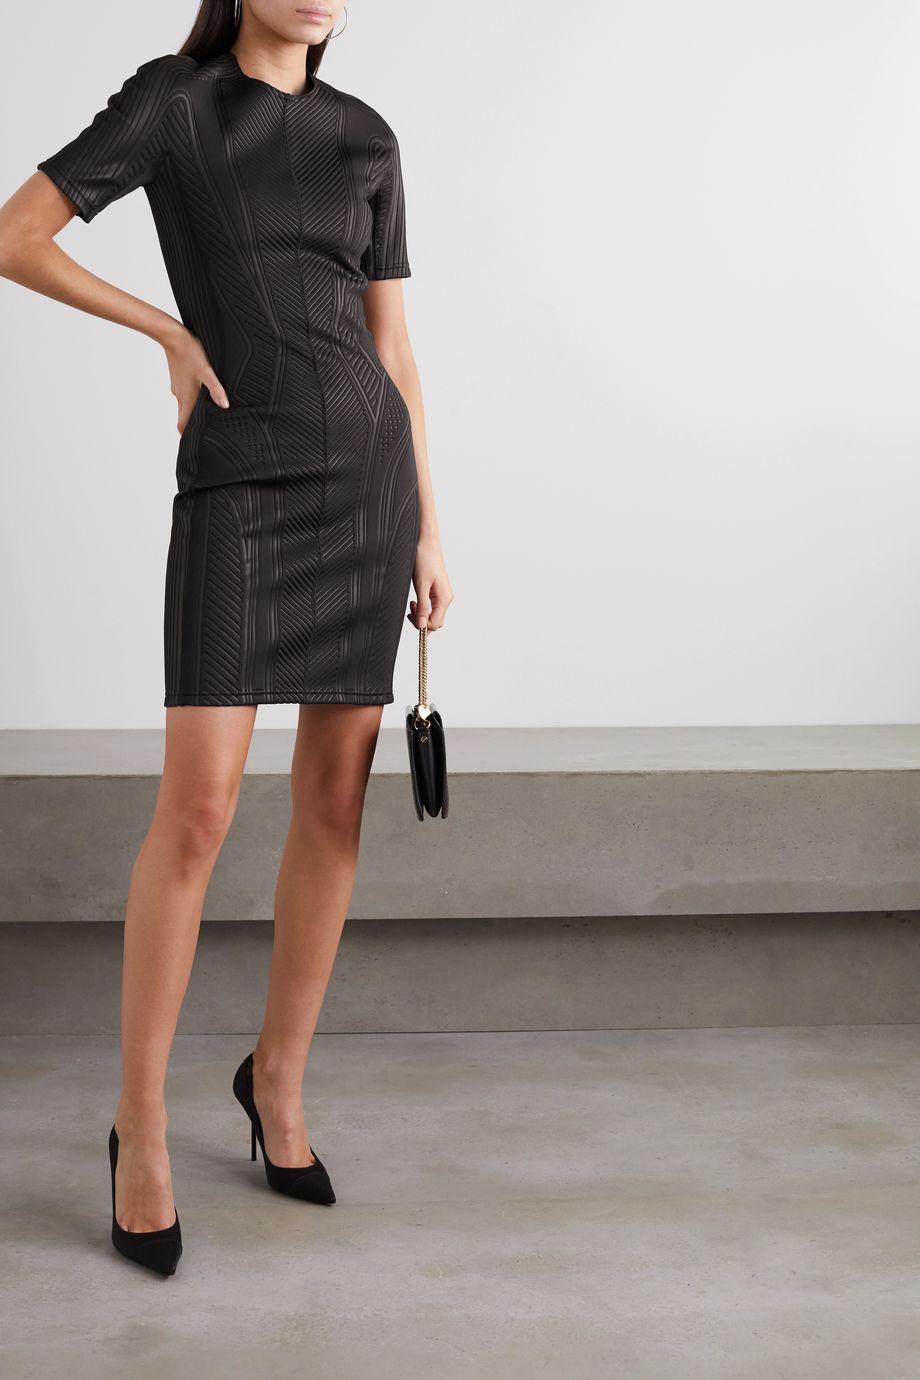 Mugler Neoprene mini dress